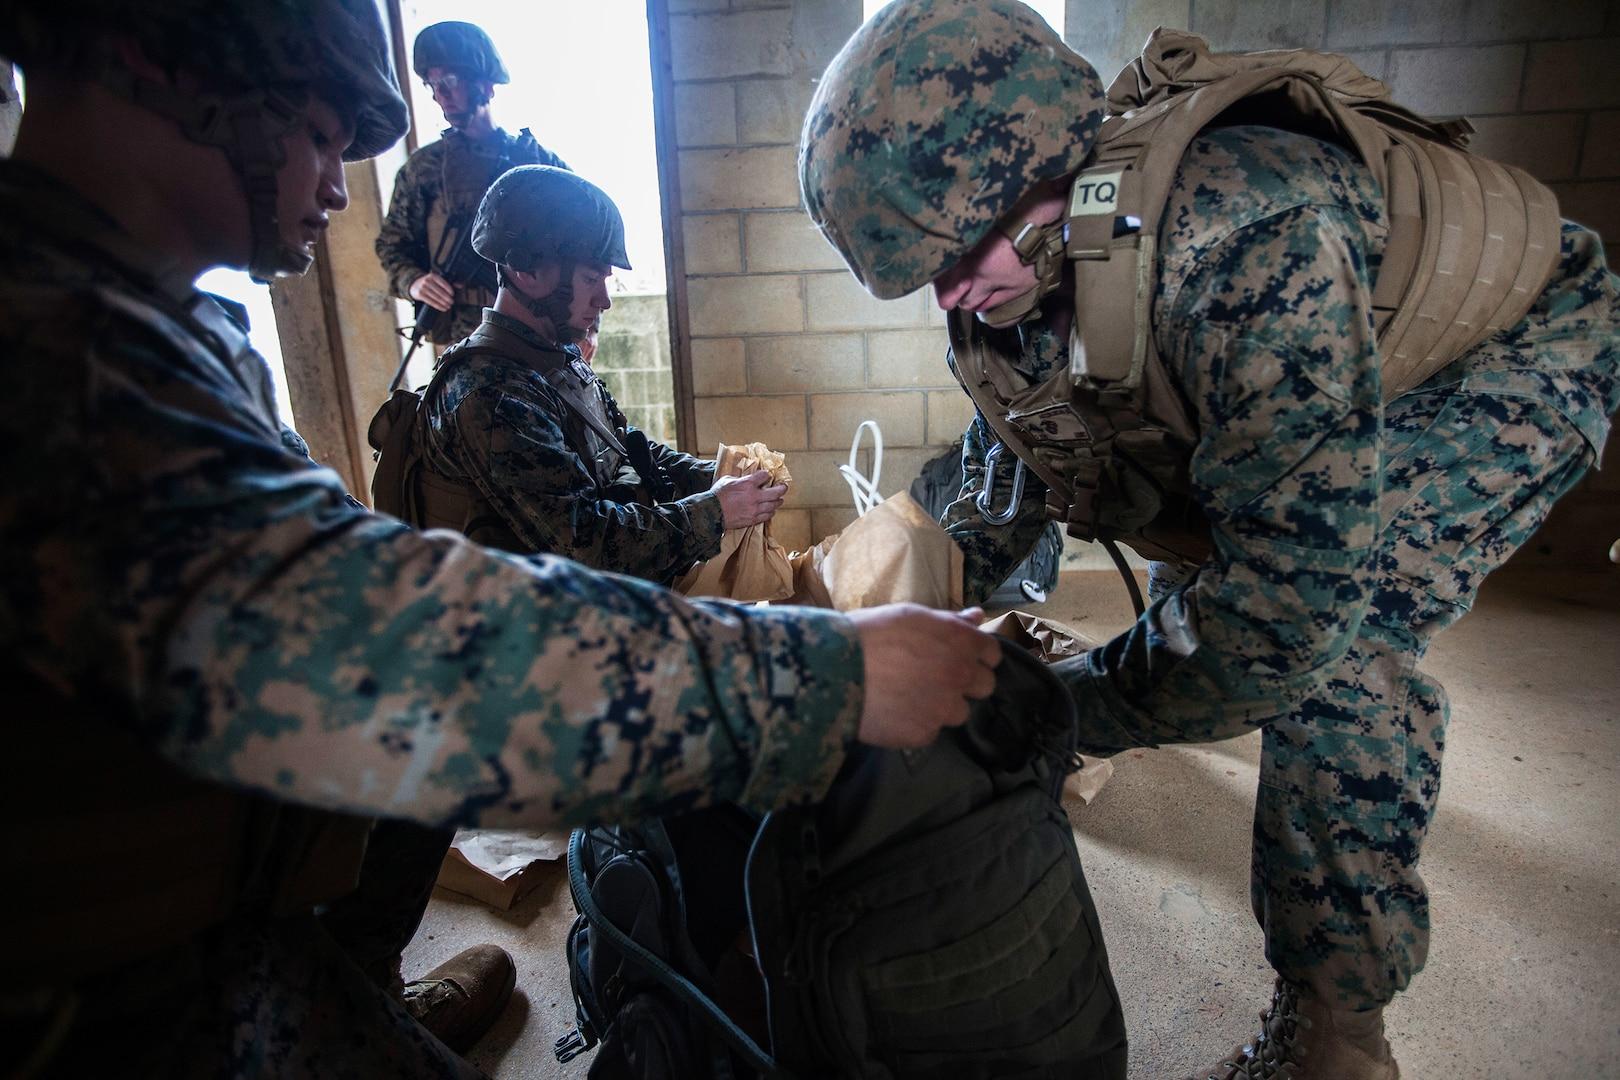 Criminal Investigator Marines polish their skills in forensic gathering, analyzing